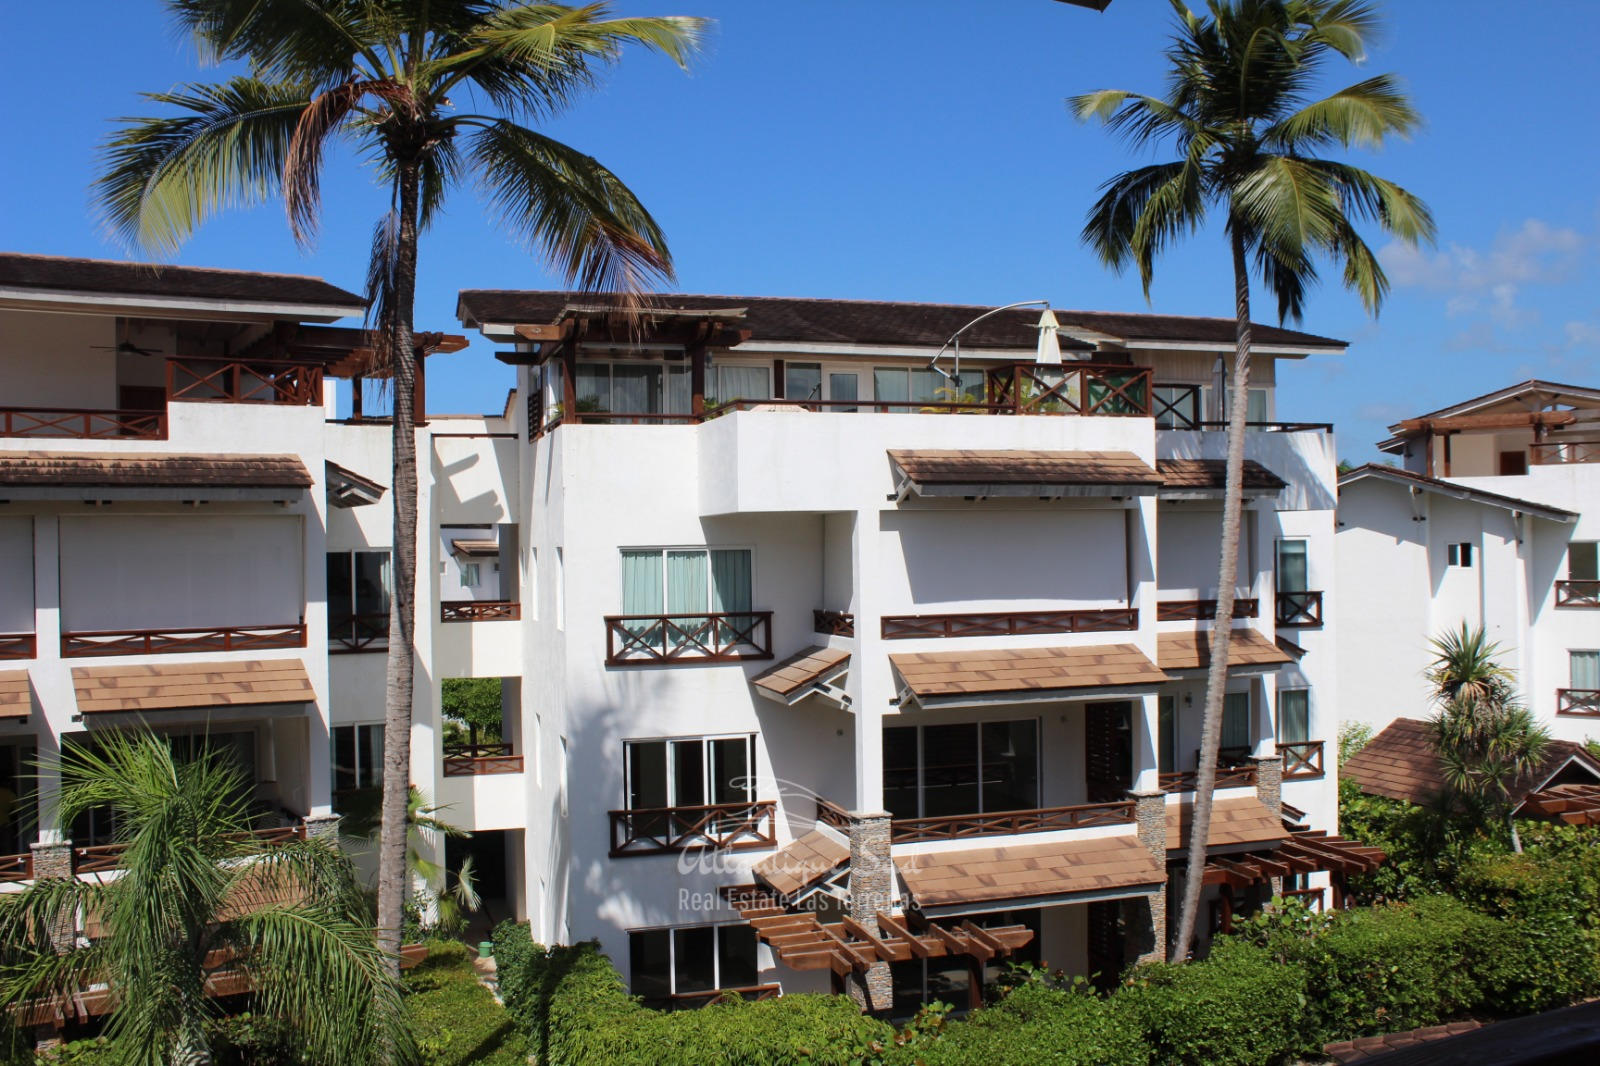 Apartments near the beach real estate las terrenas dominican republic 31 (7).jpg